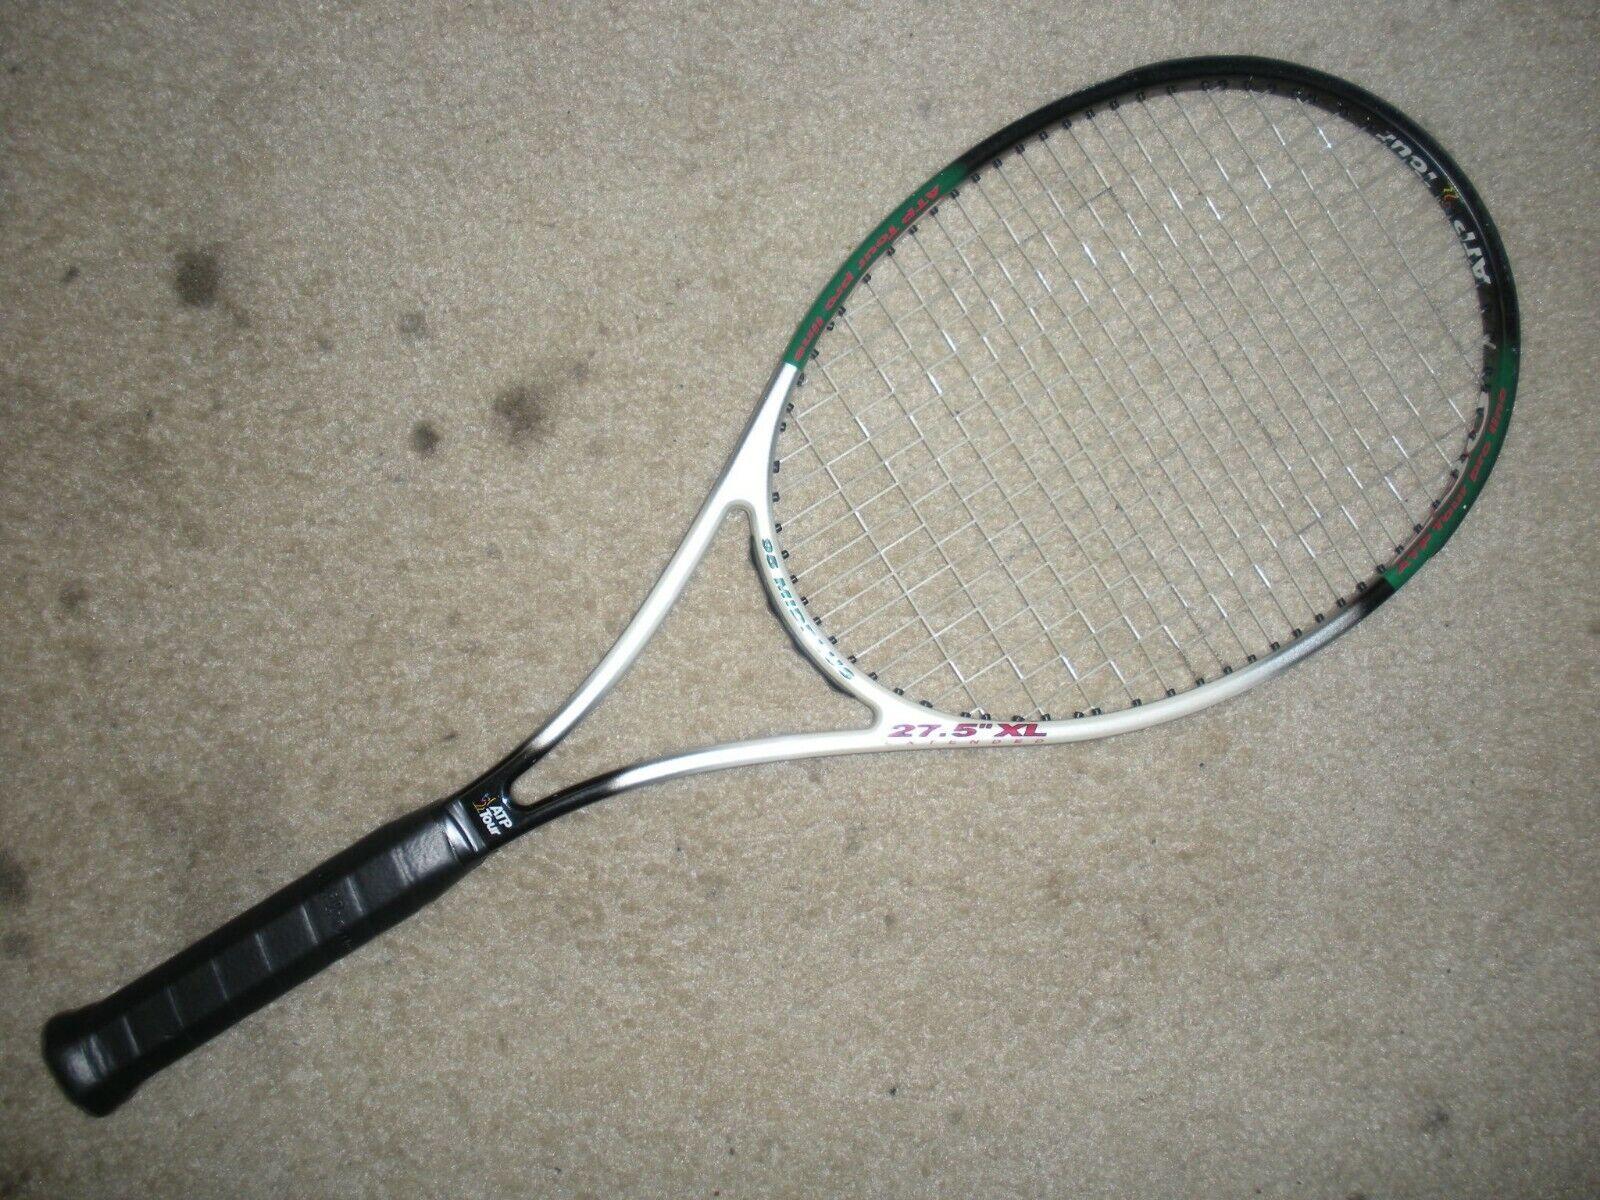 Spalding ATP Tour Pro Line XL Midplus 95 tenis raqueta 4 5 8 27.5  de largo